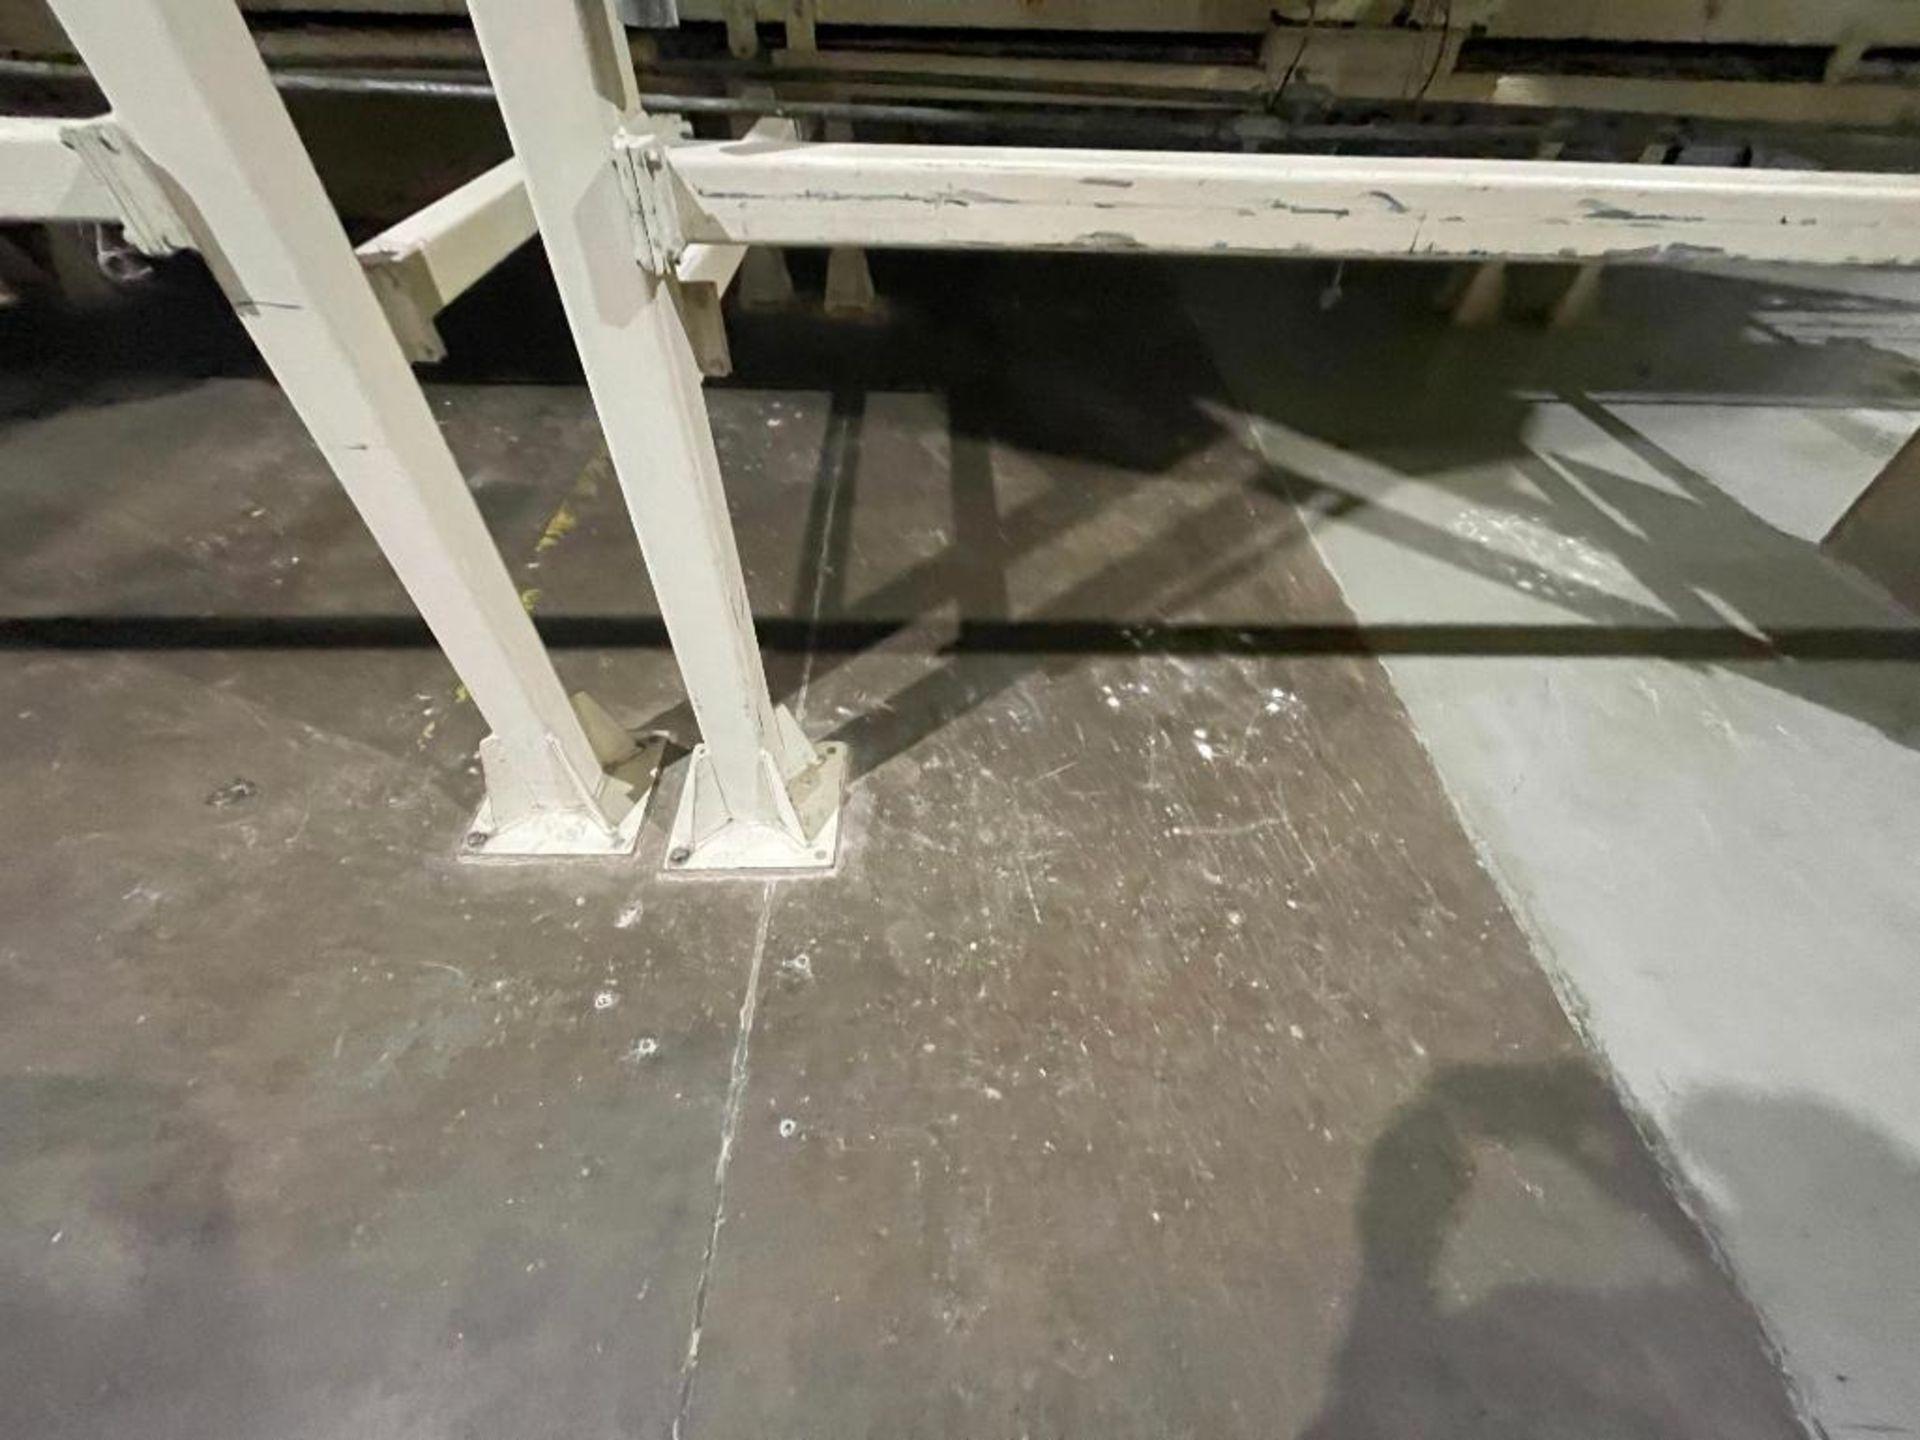 Aseeco mild steel cone bottom bulk storage bin - Image 3 of 31